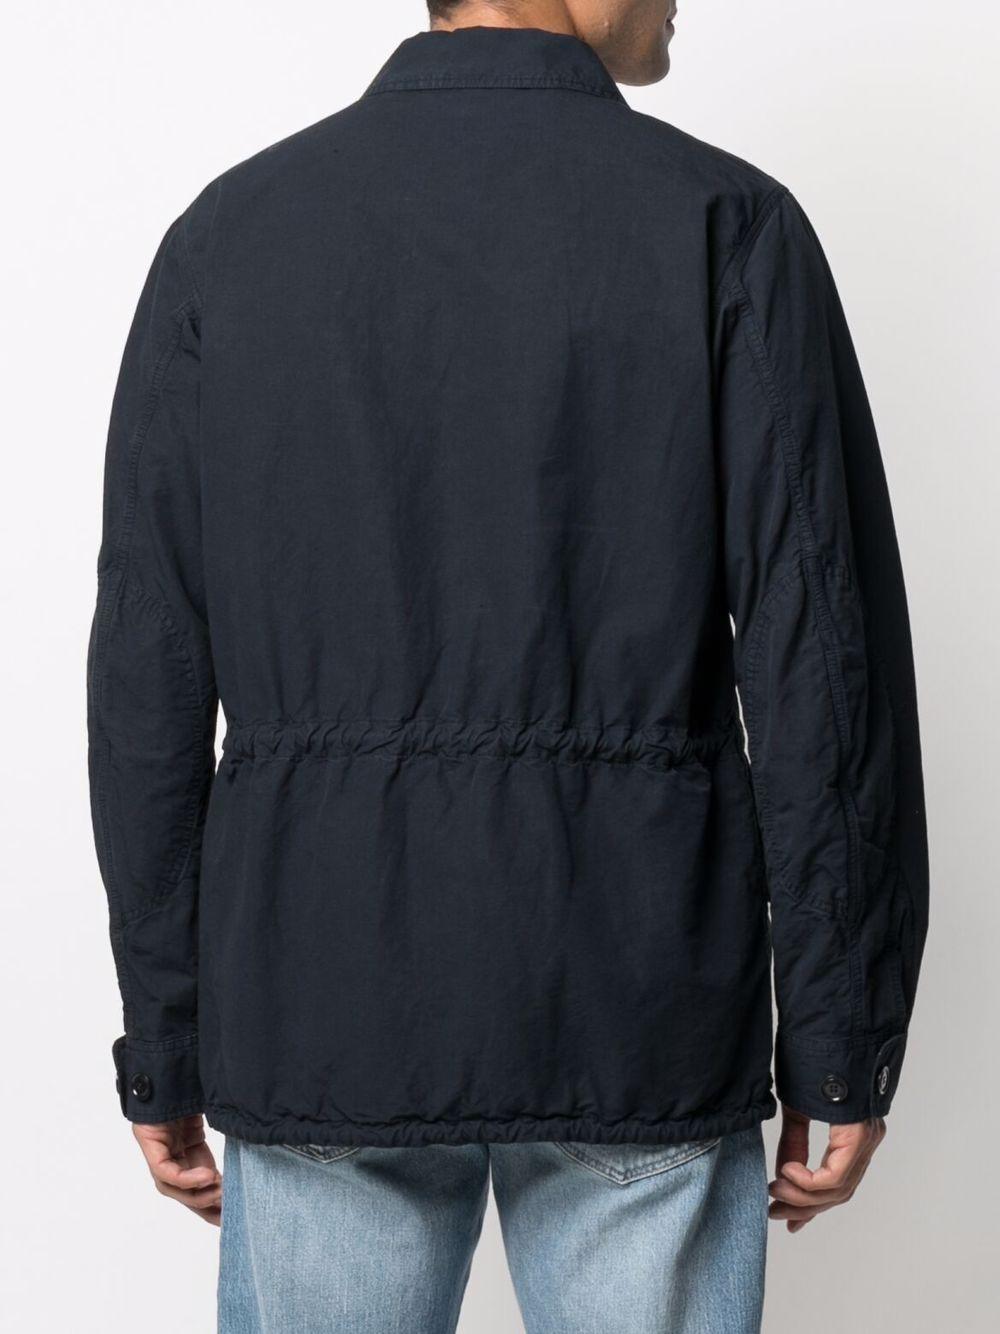 Picture of Aspesi   Cotton-Linen Blend Jacket